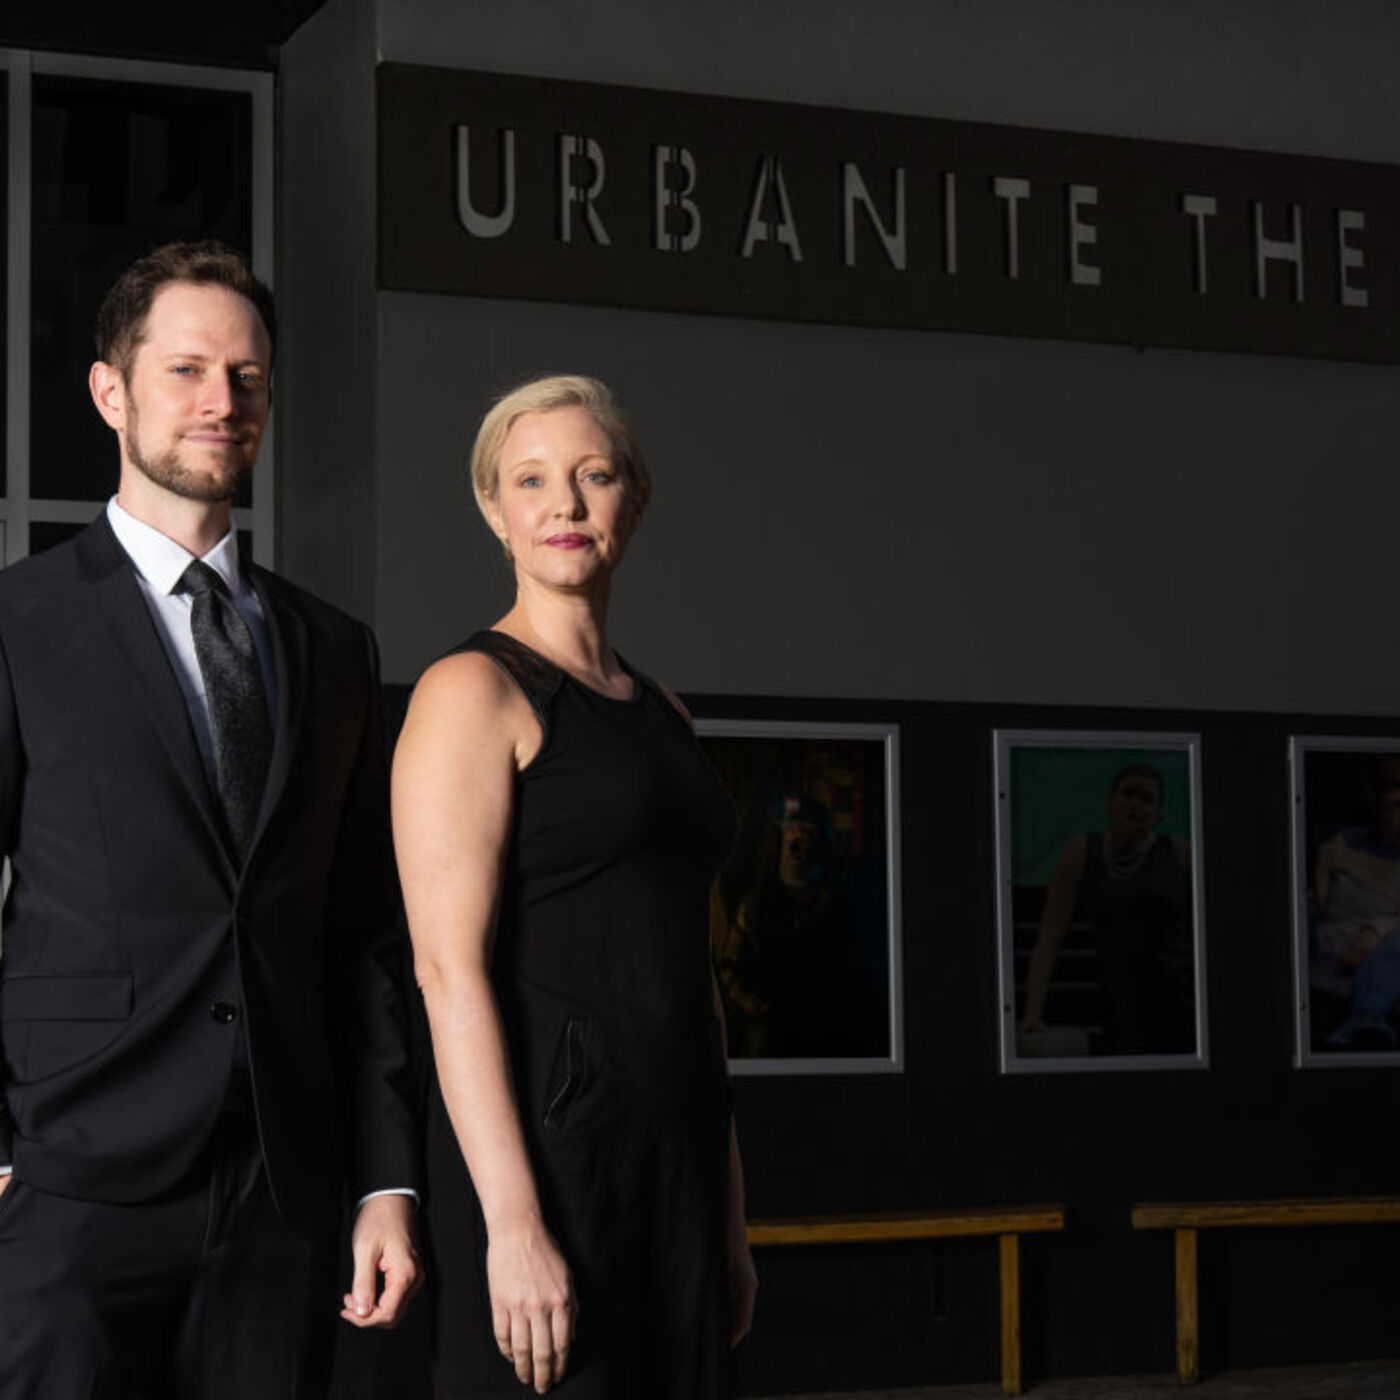 Urbanite Theatre's Brendan Ragan and Summer Dawn Wallace Join the Club